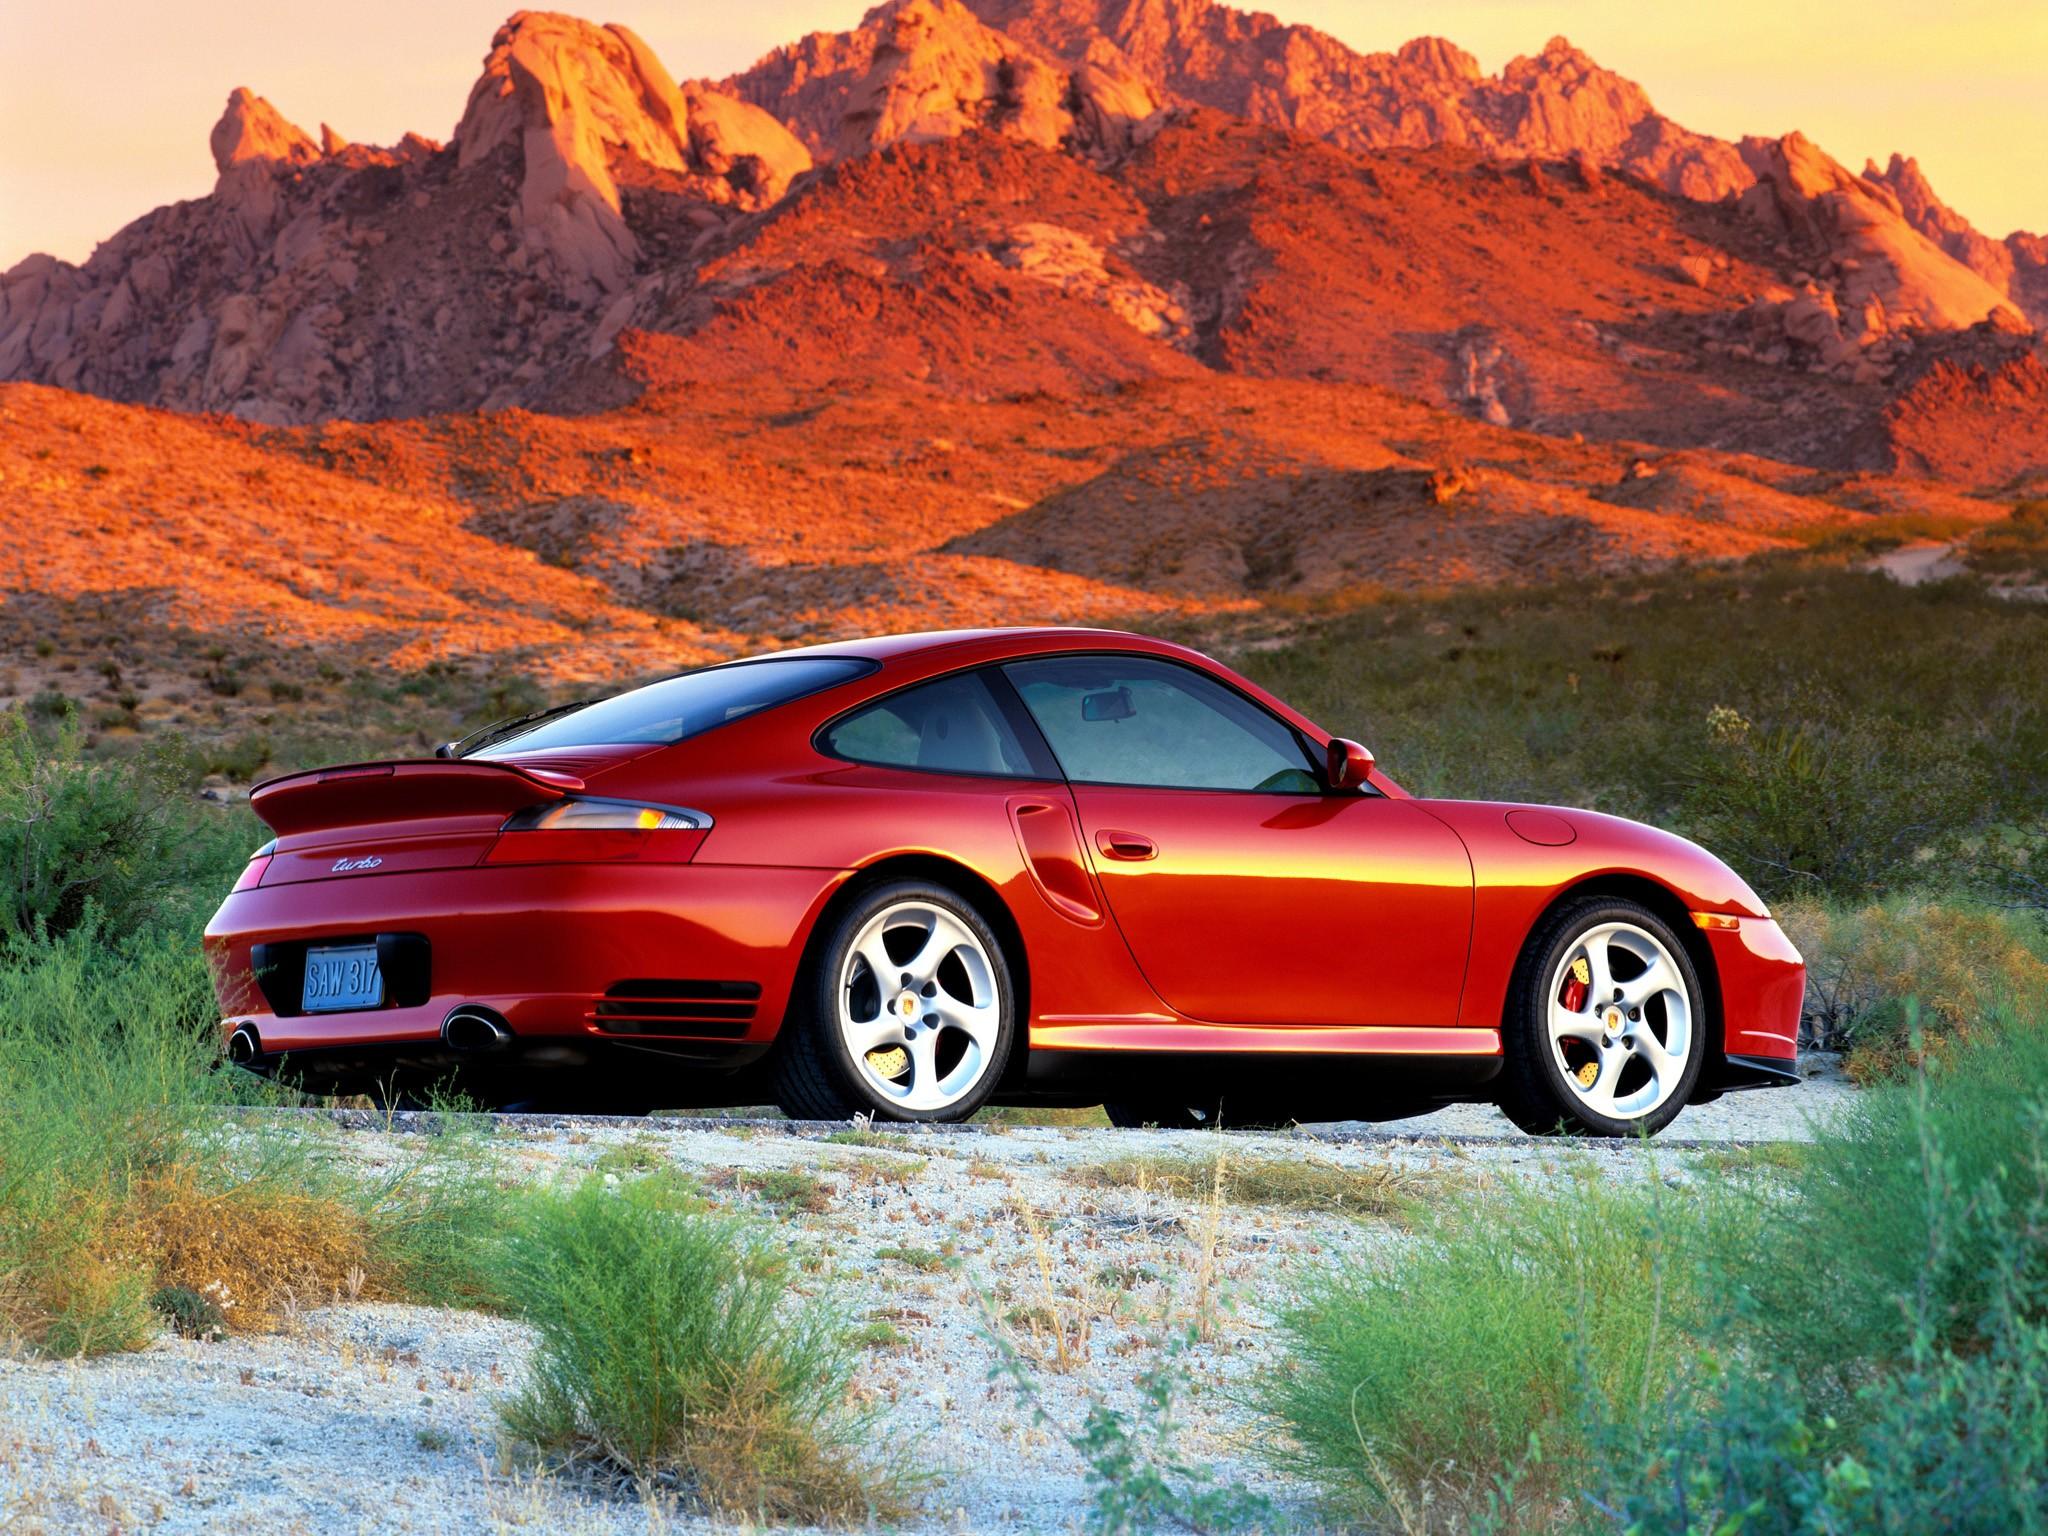 porsche 911 turbo 996 specs photos 2000 2001 2002 2003 2004 2005 2006 autoevolution. Black Bedroom Furniture Sets. Home Design Ideas